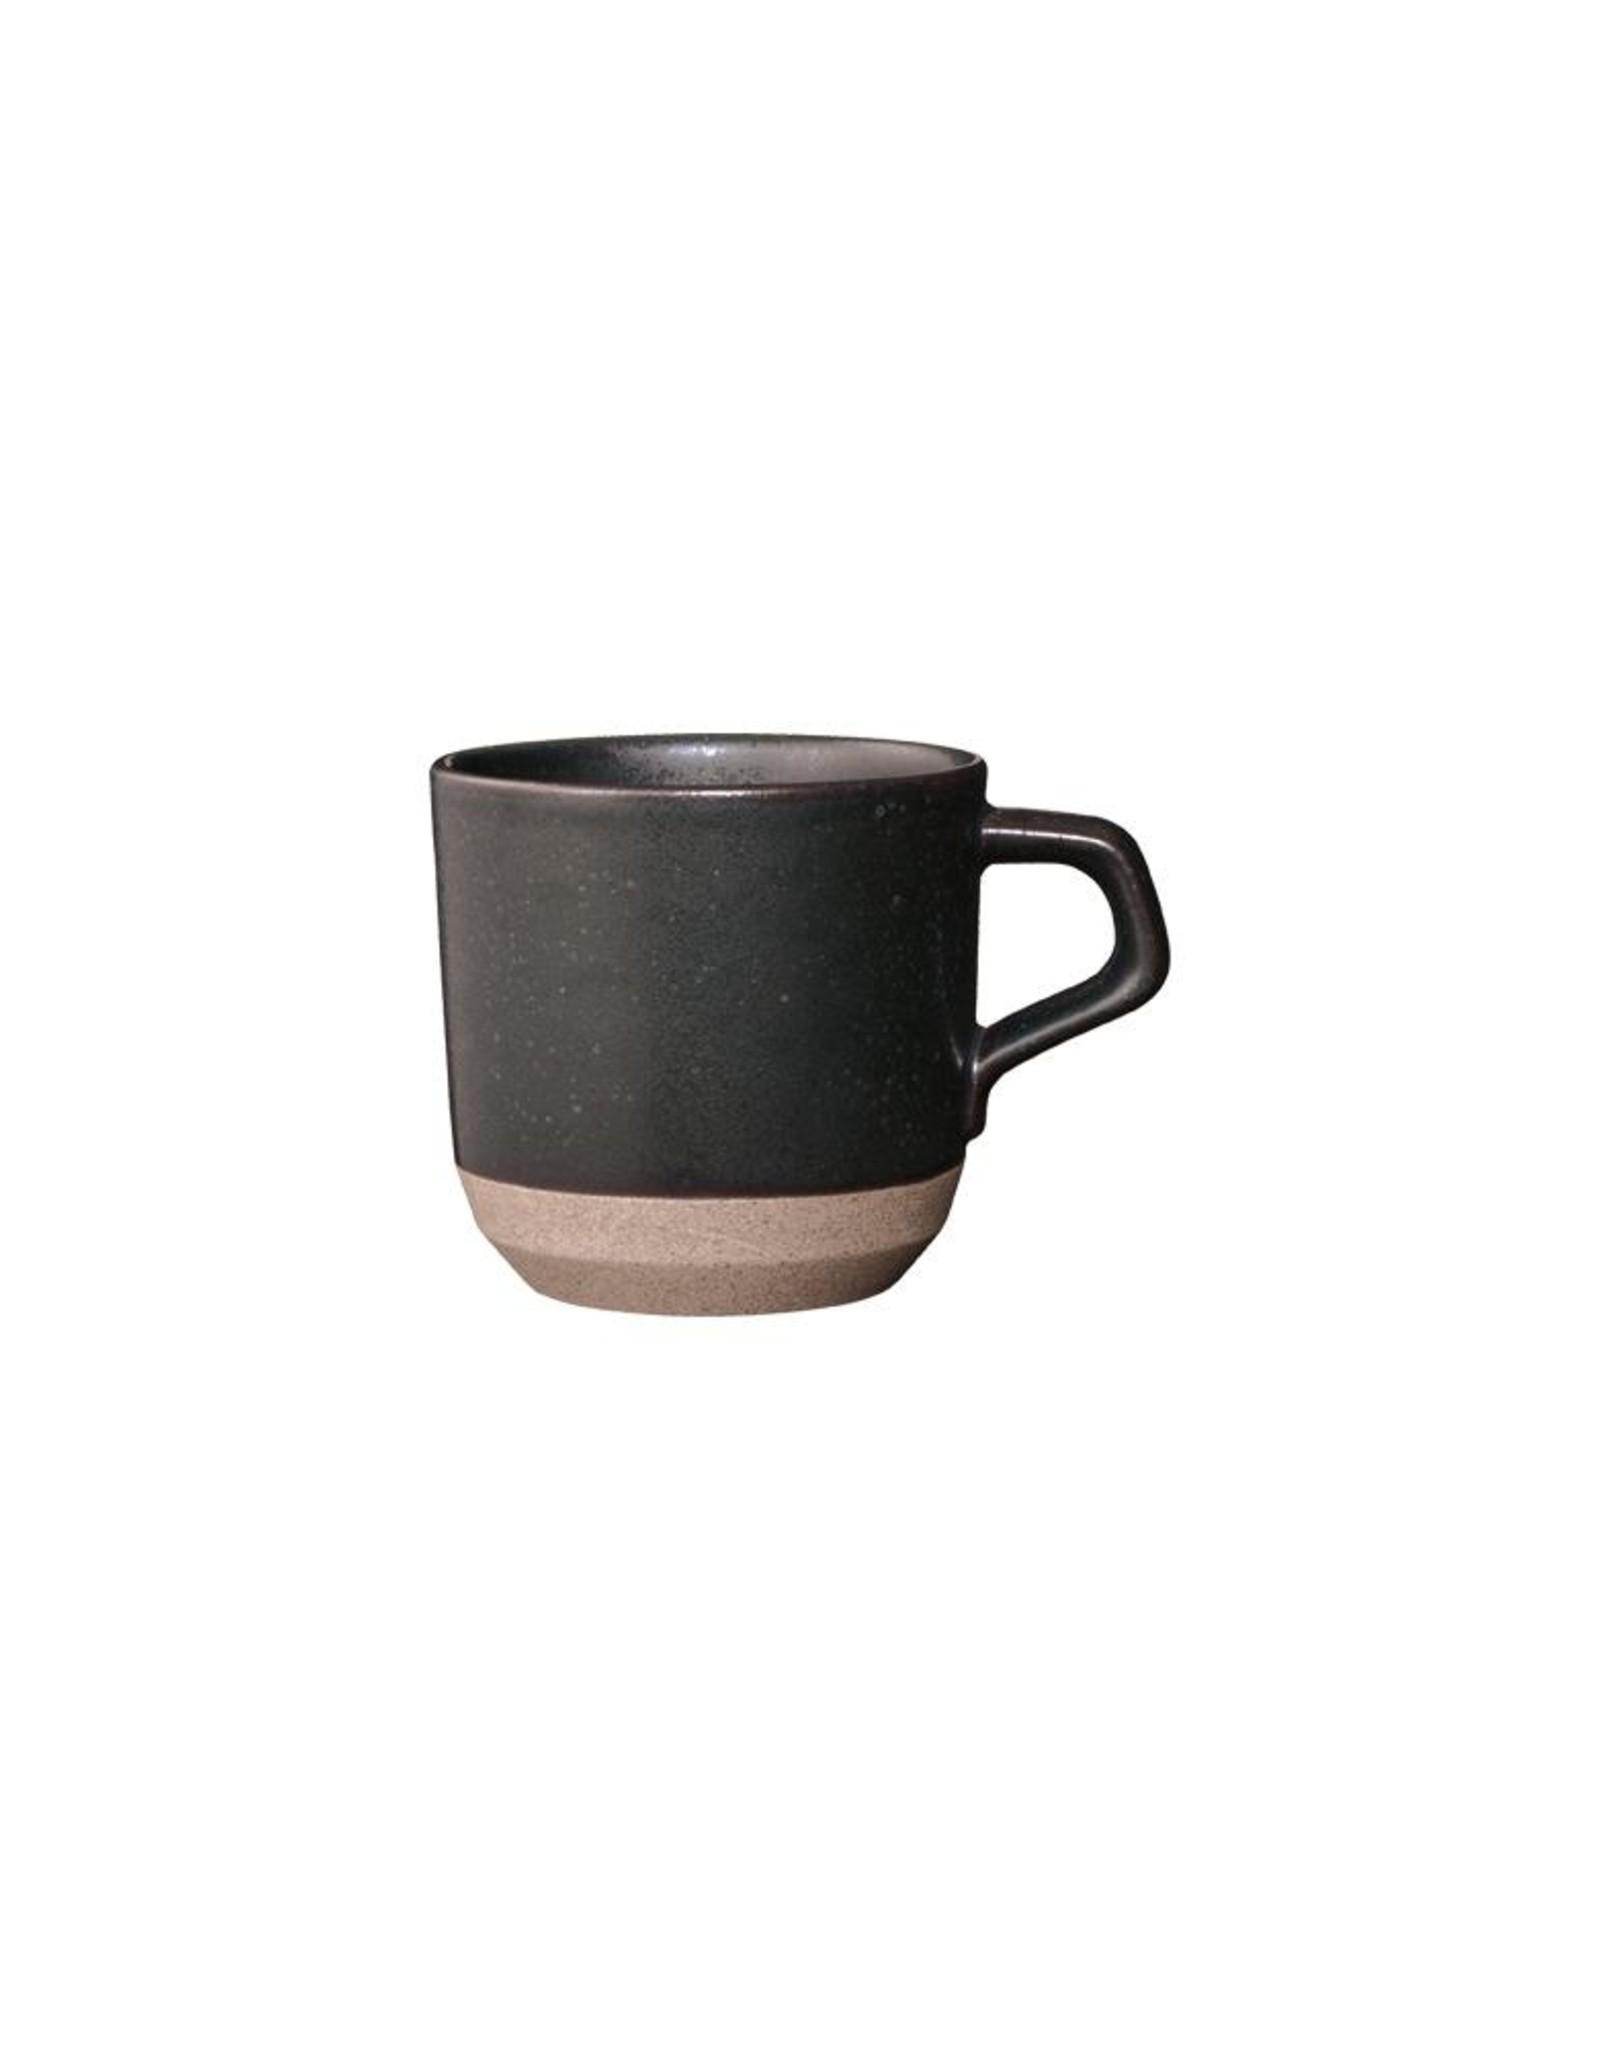 Kinto - Tasse en Céramique - 300 ml